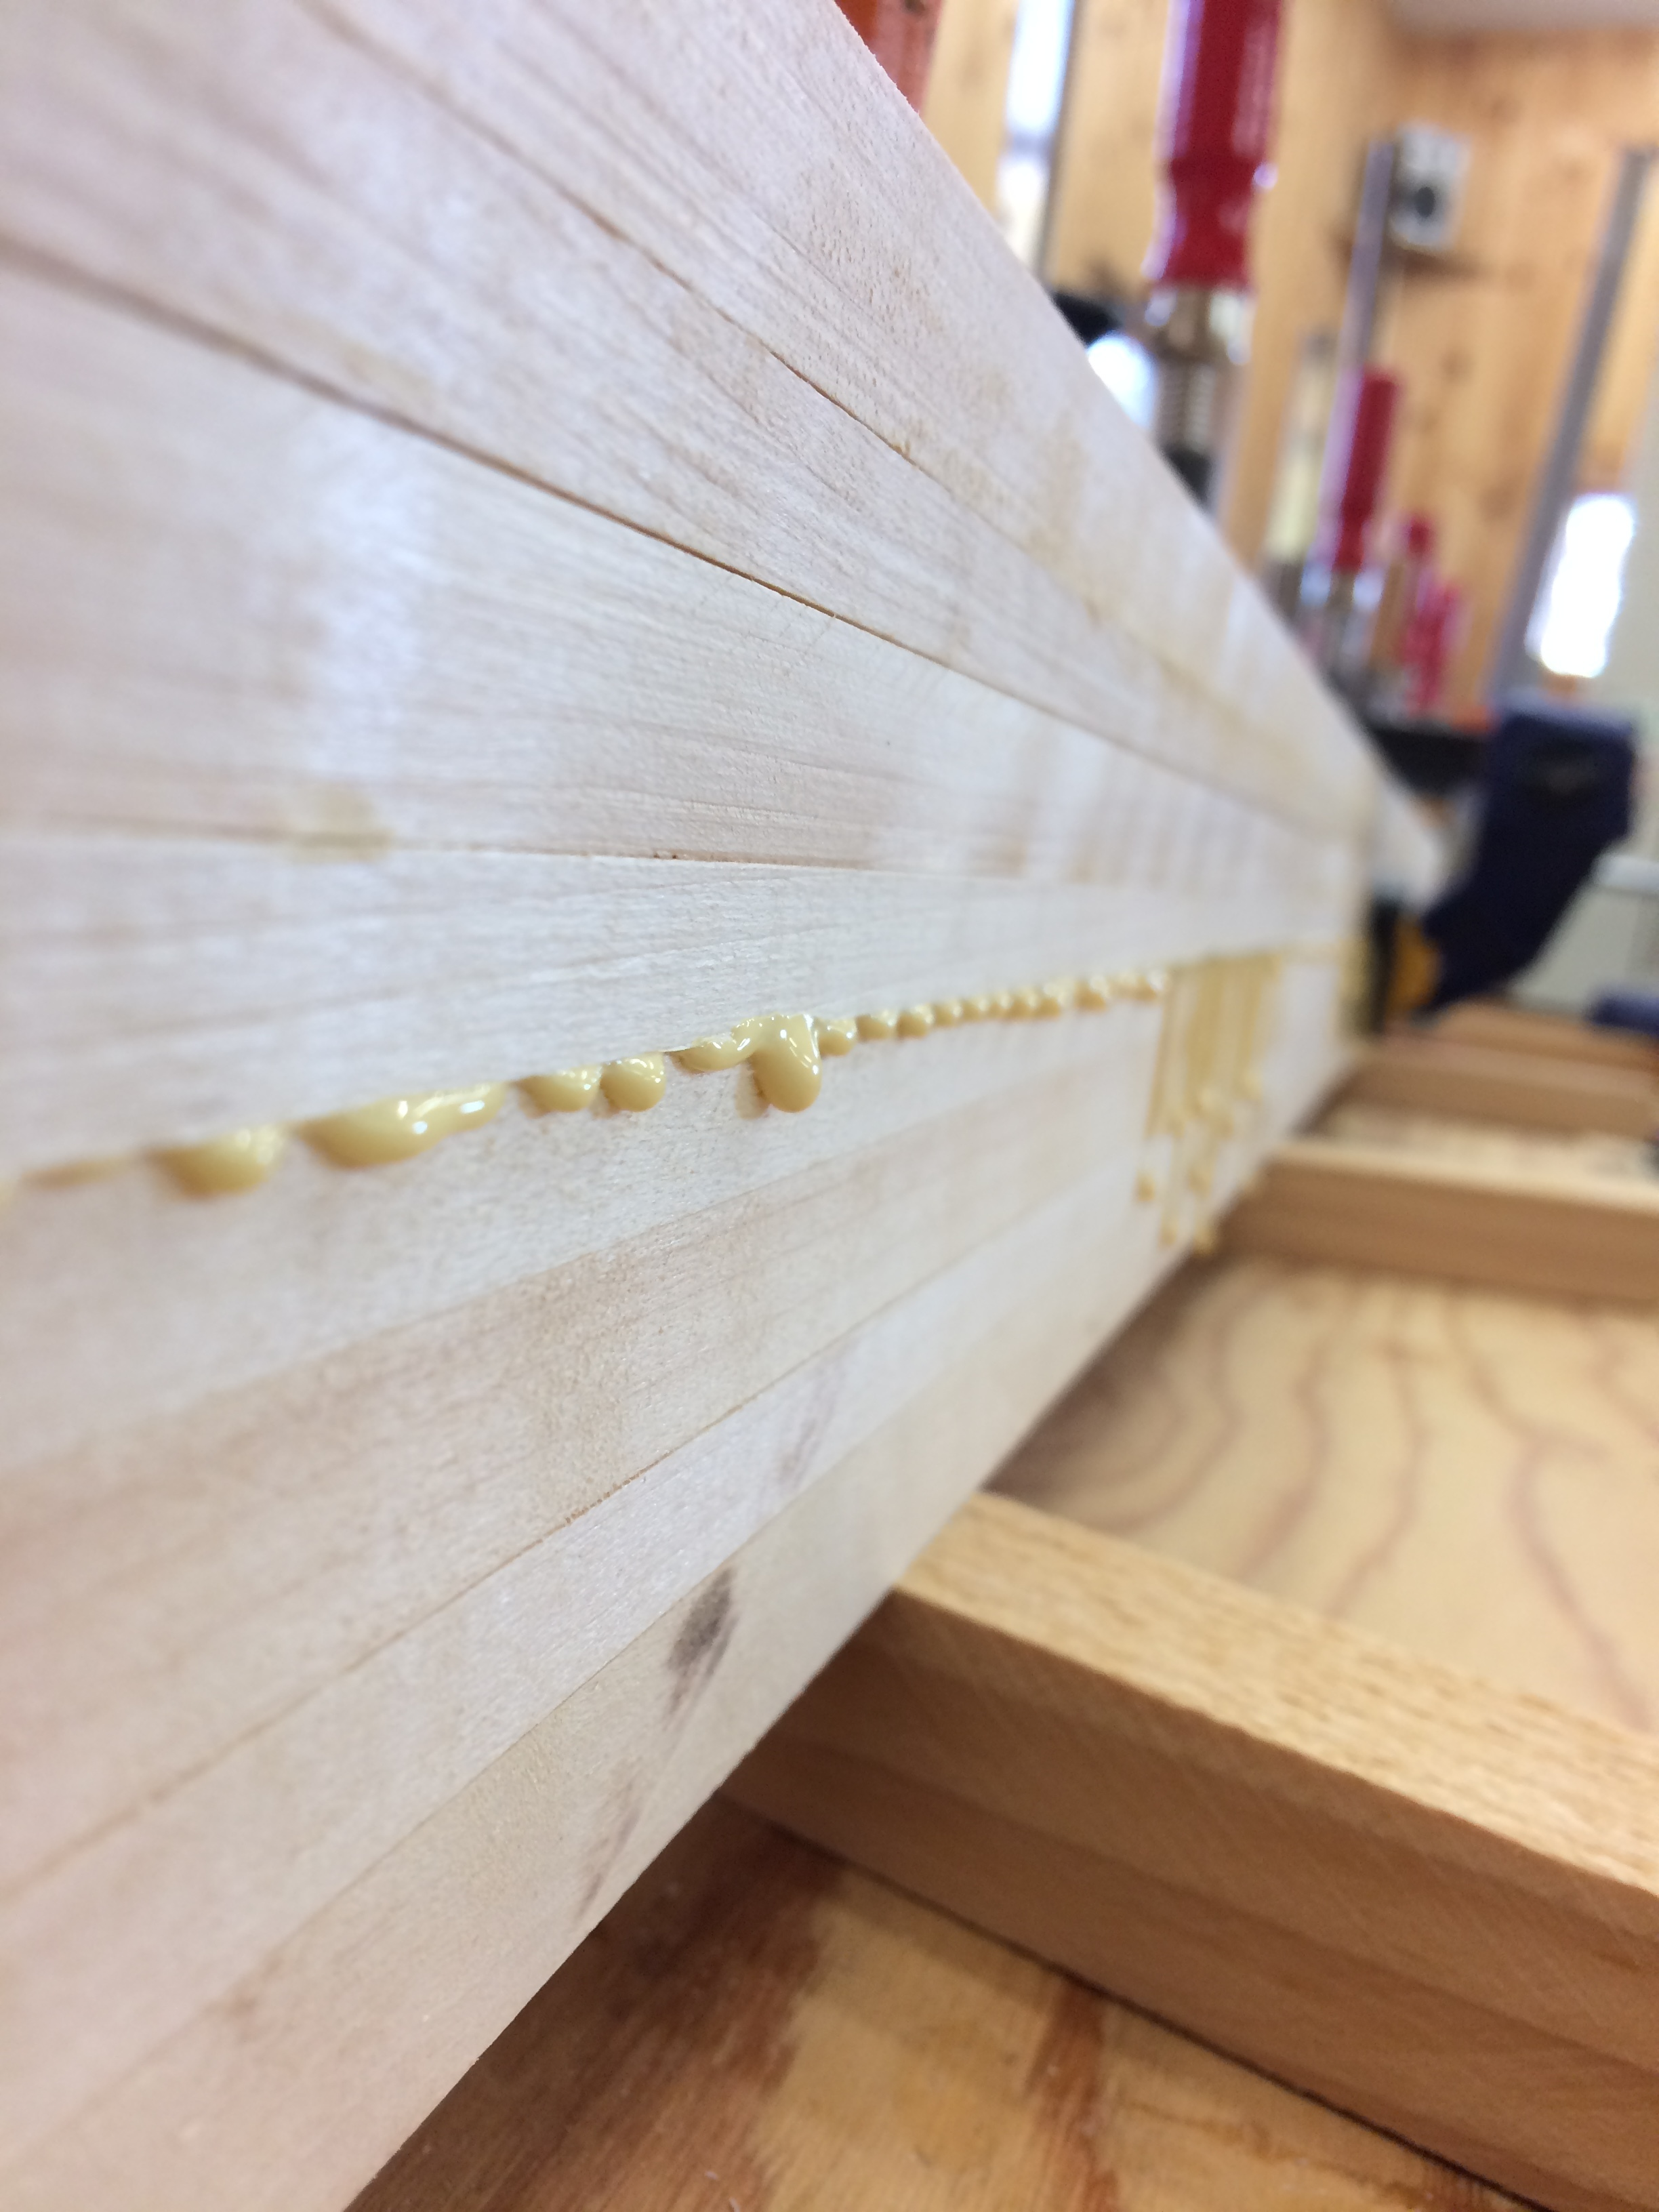 Laminating the cores symmetrically for a consistent edge-to-edge flex